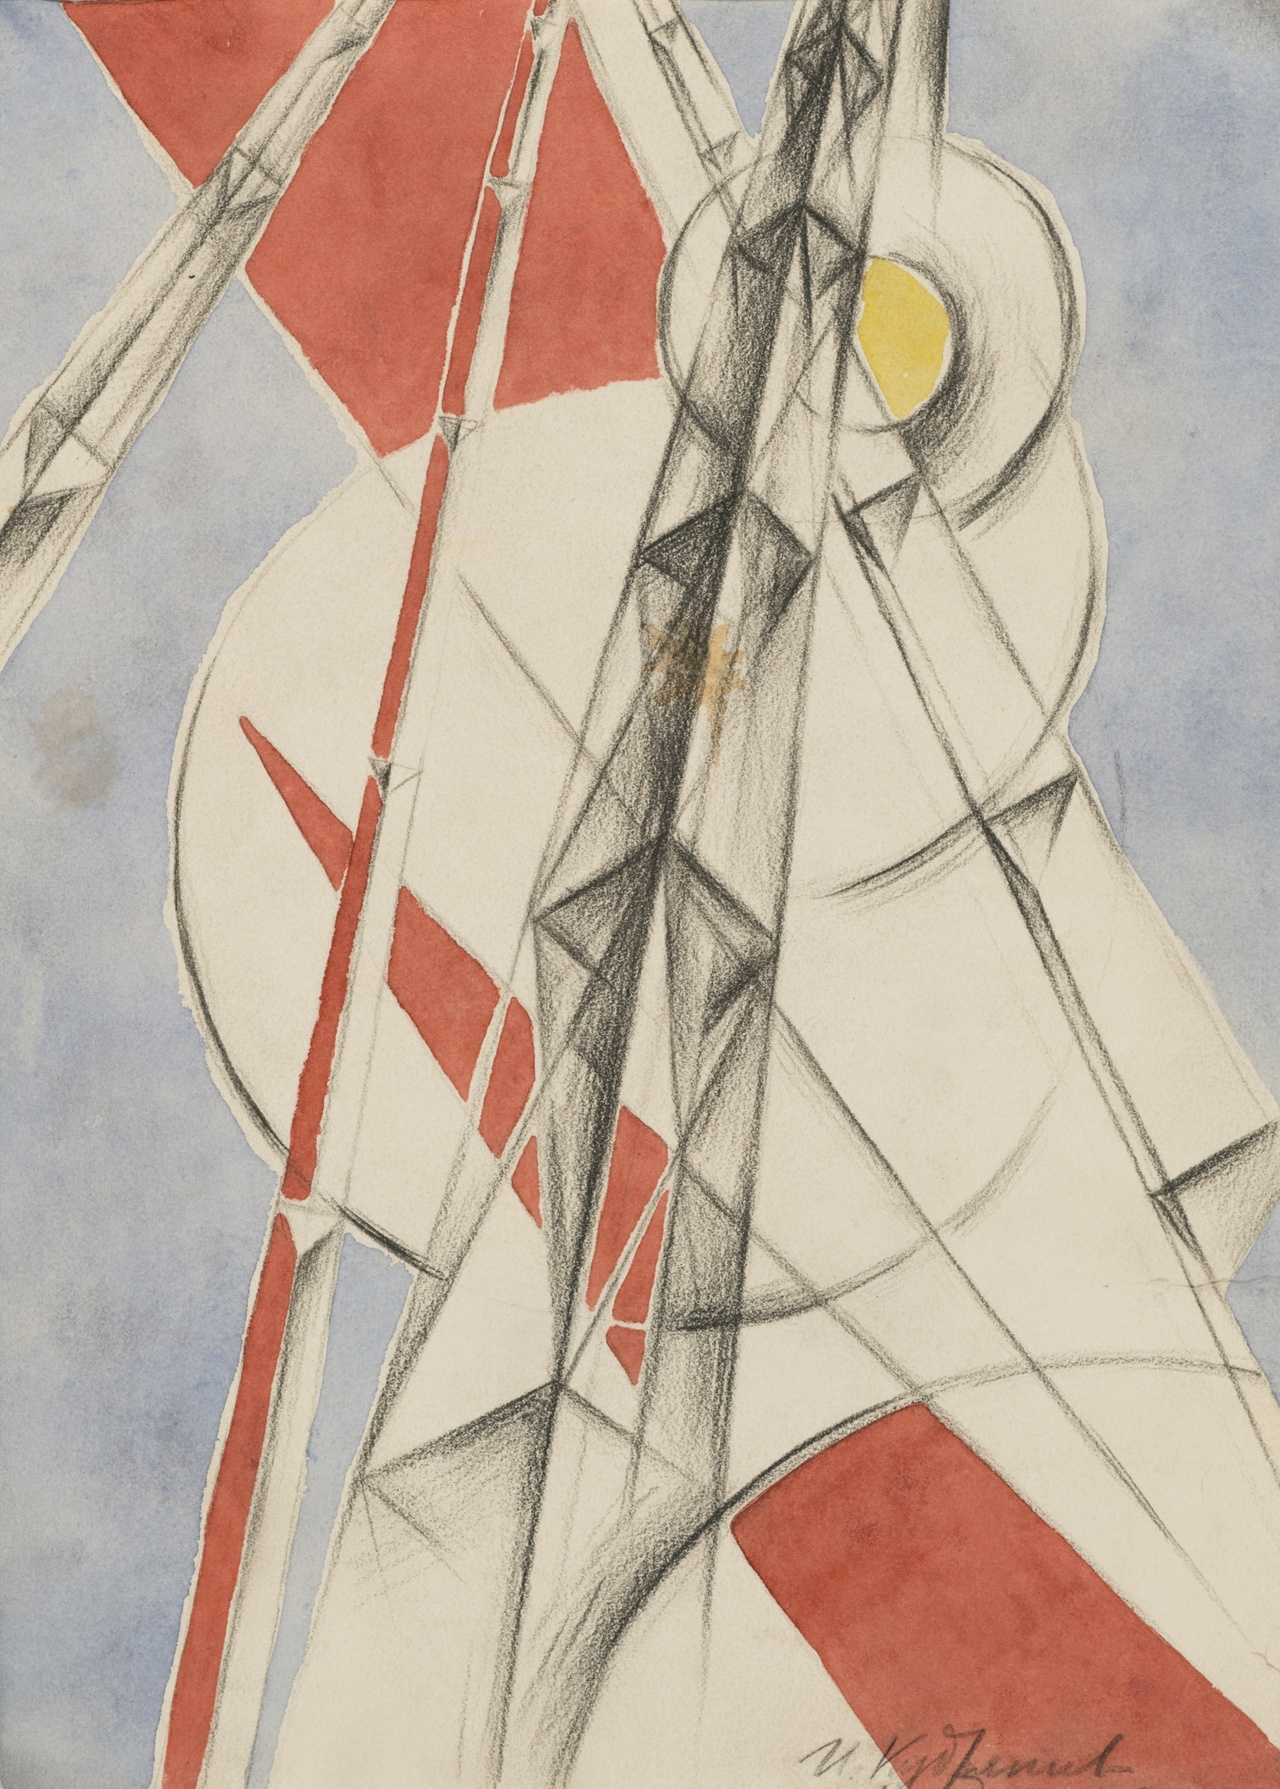 Ivan Kudryashev (Russian, 1896-1972), The Birth of the Sun. The Flight.